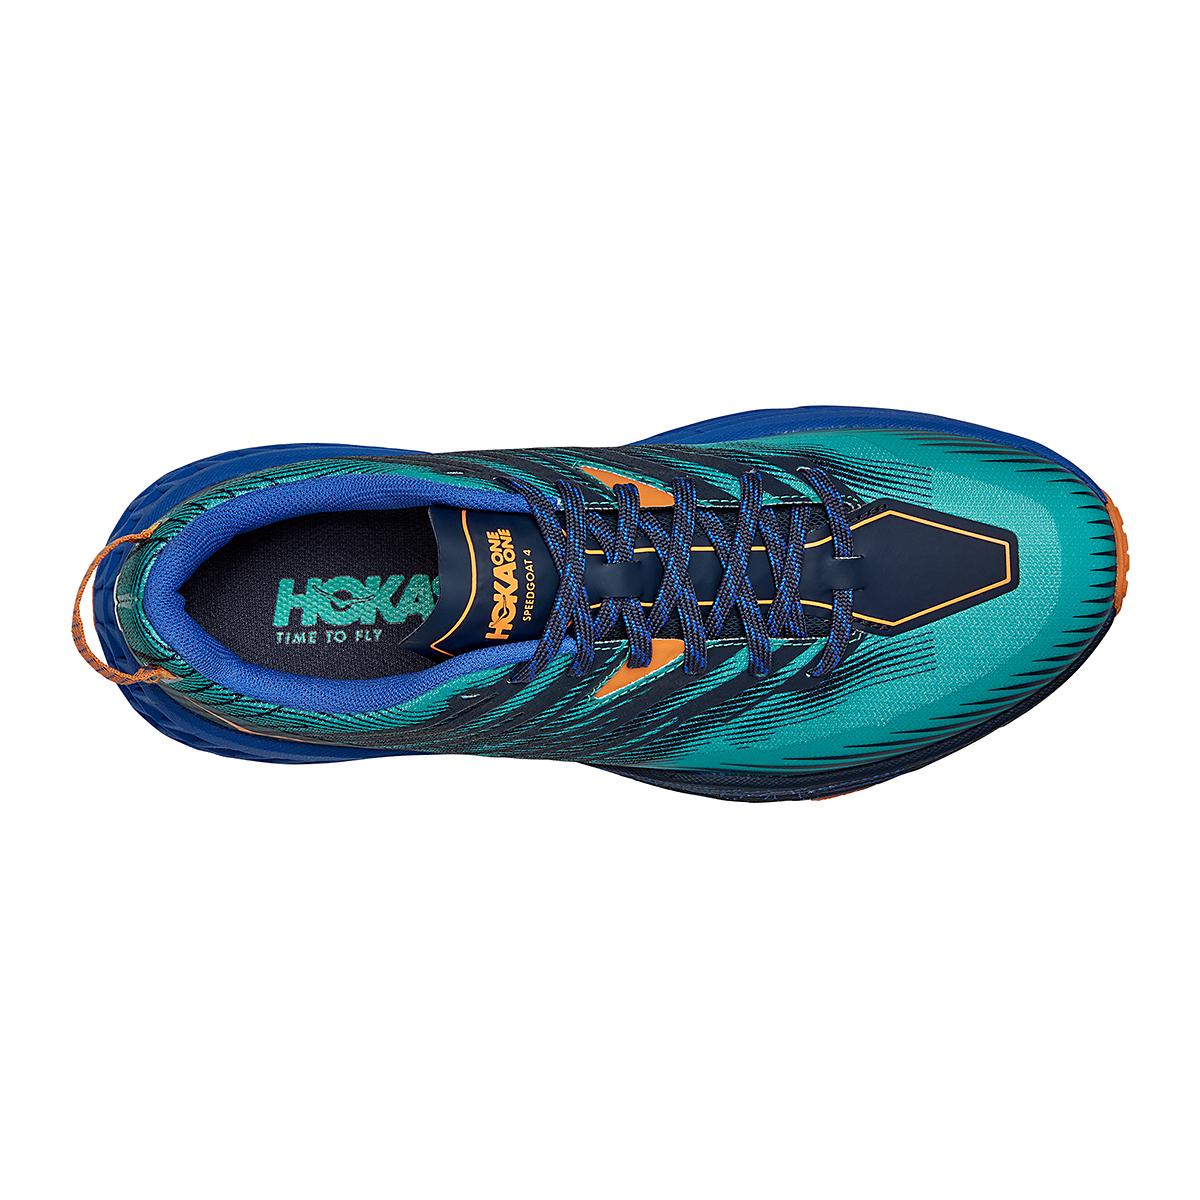 Men's Hoka One One Speedgoat 4 Trail Running Shoe - Color: Atlantis/Dazzling Blue - Size: 7 - Width: Regular, Atlantis/Dazzling Blue, large, image 5